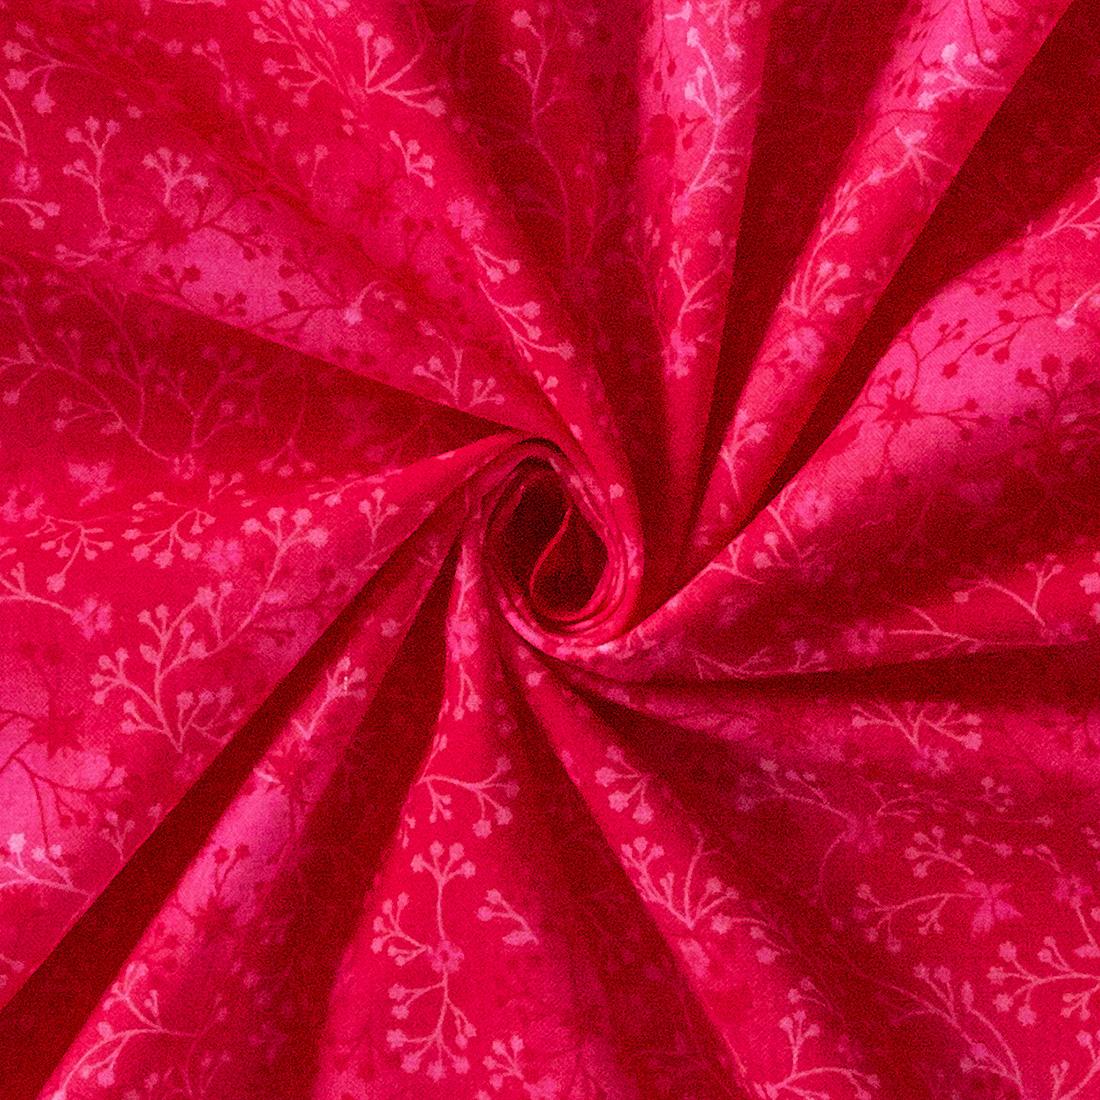 Cotton Floral Fuchsia Blend Craft Fabric